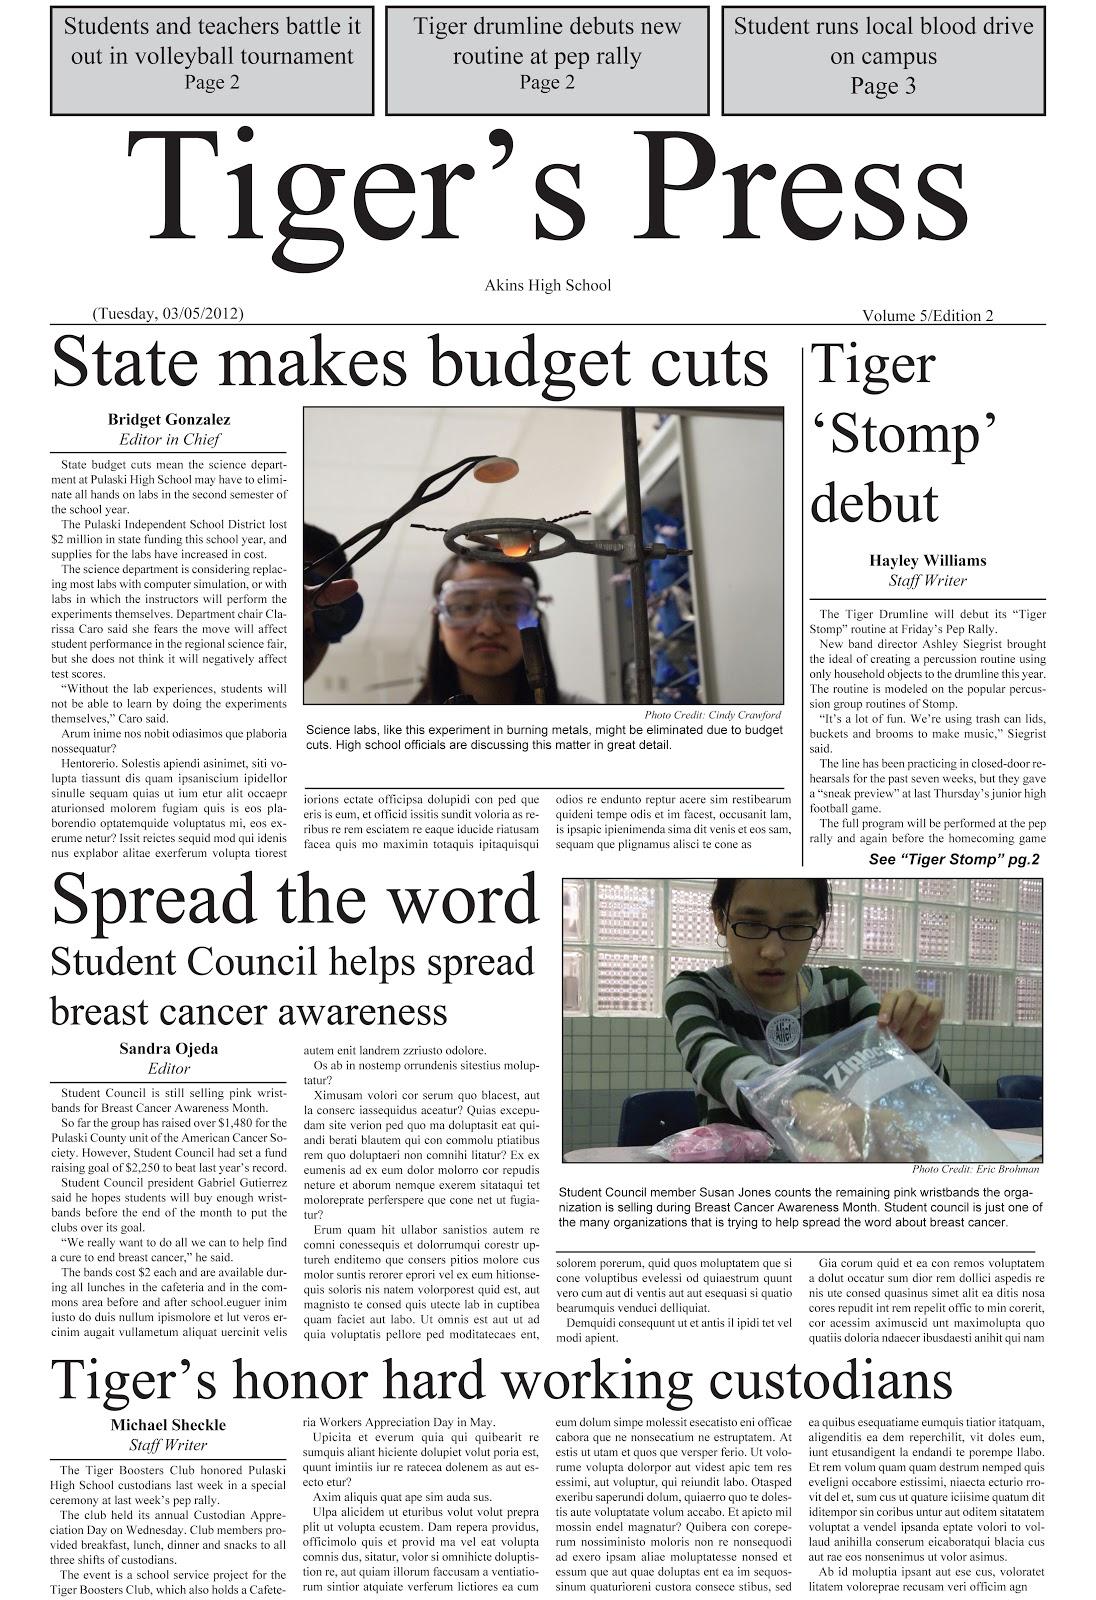 How to Write a Newspaper Photo Caption